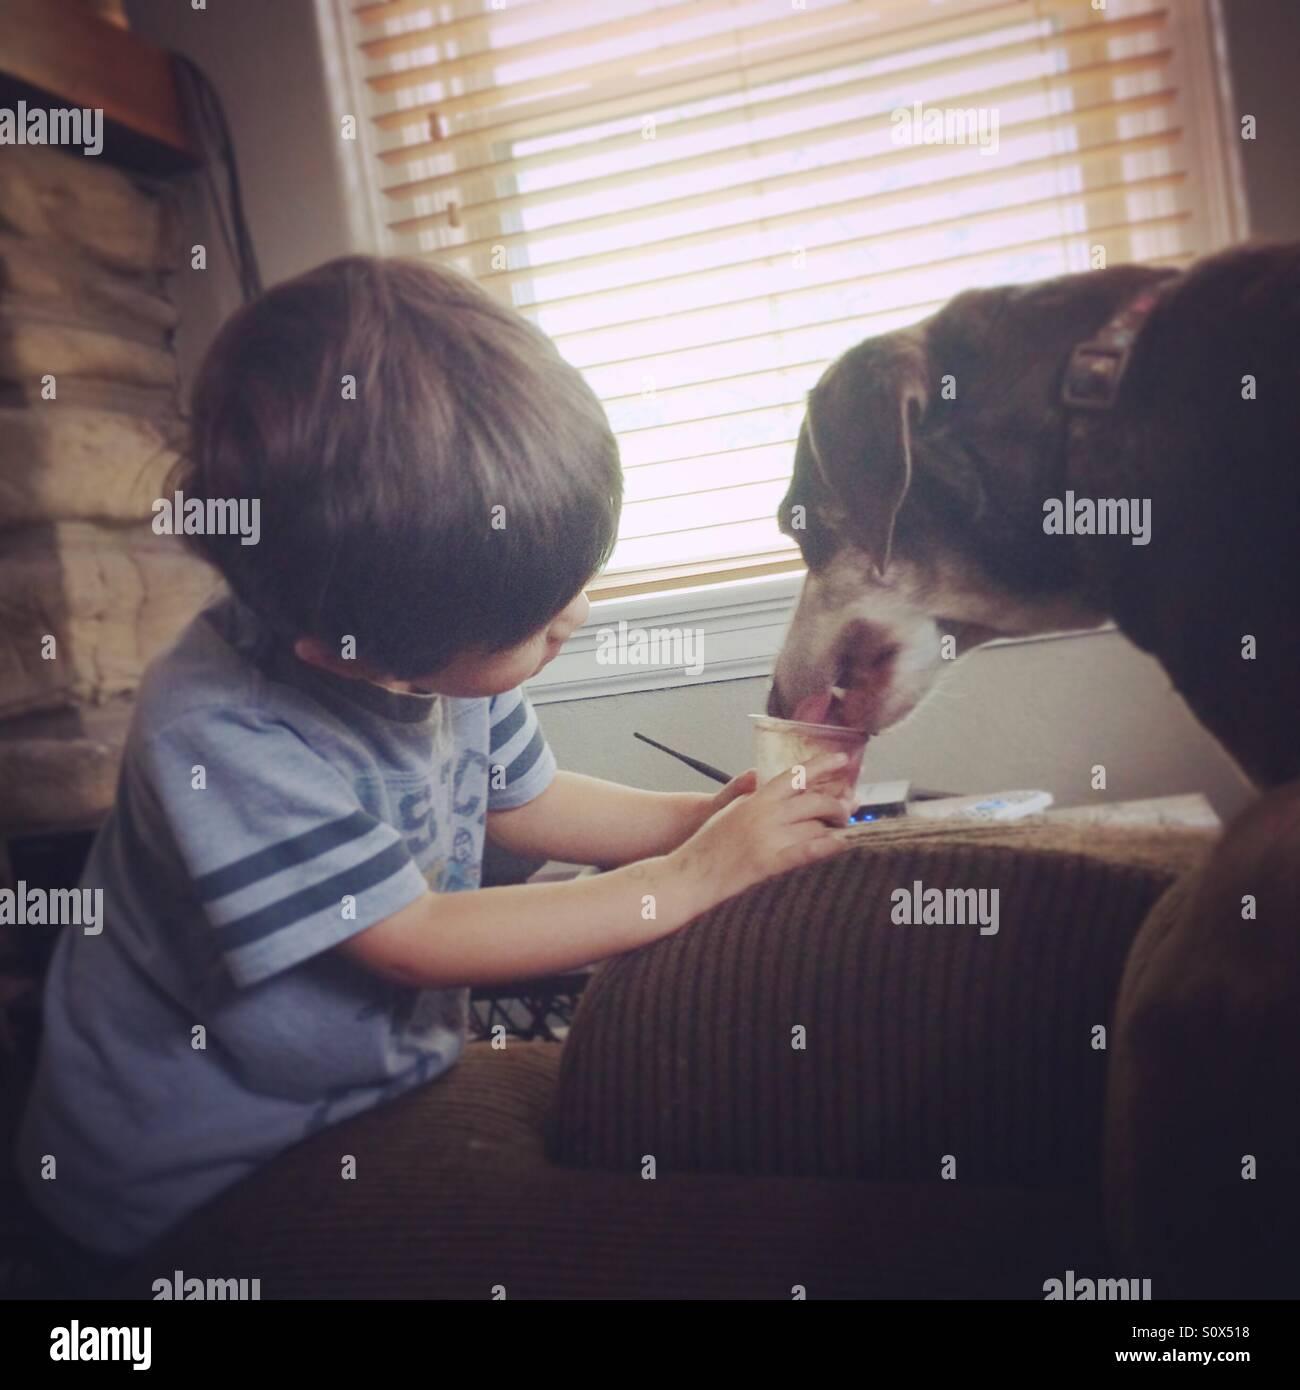 Sharing pudding - Stock Image